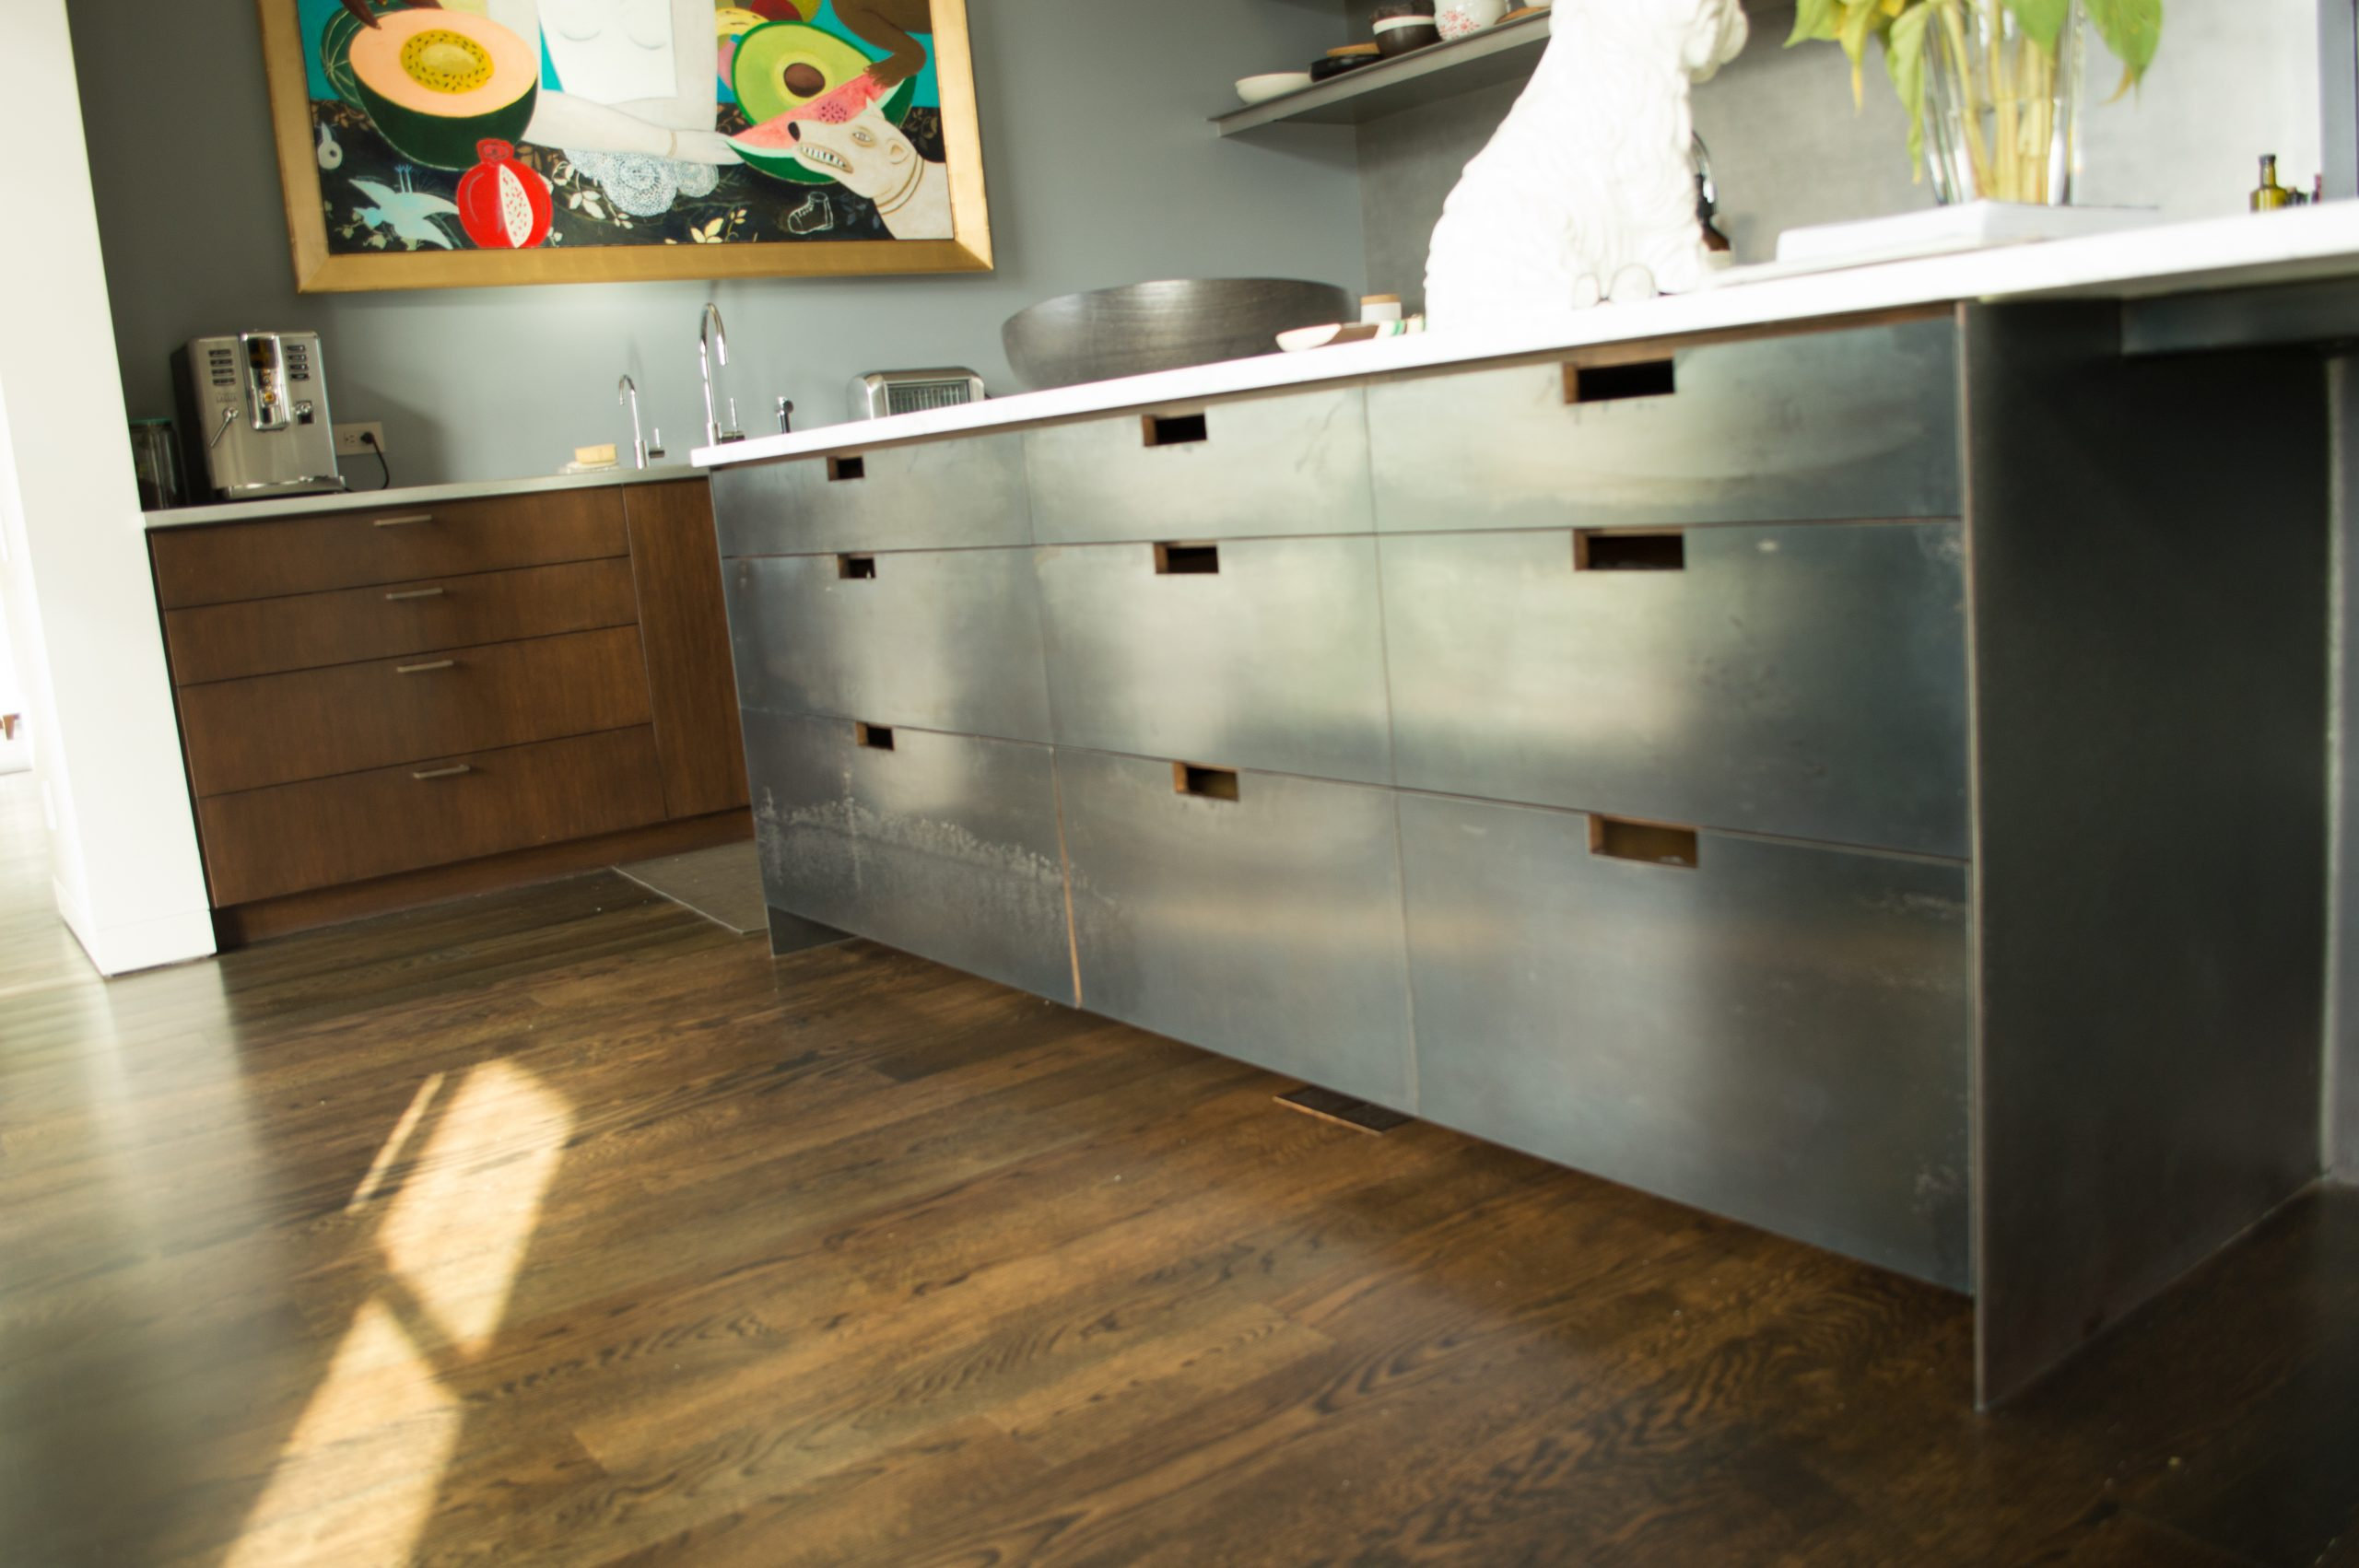 mw design workshop custom cabinetry cladding